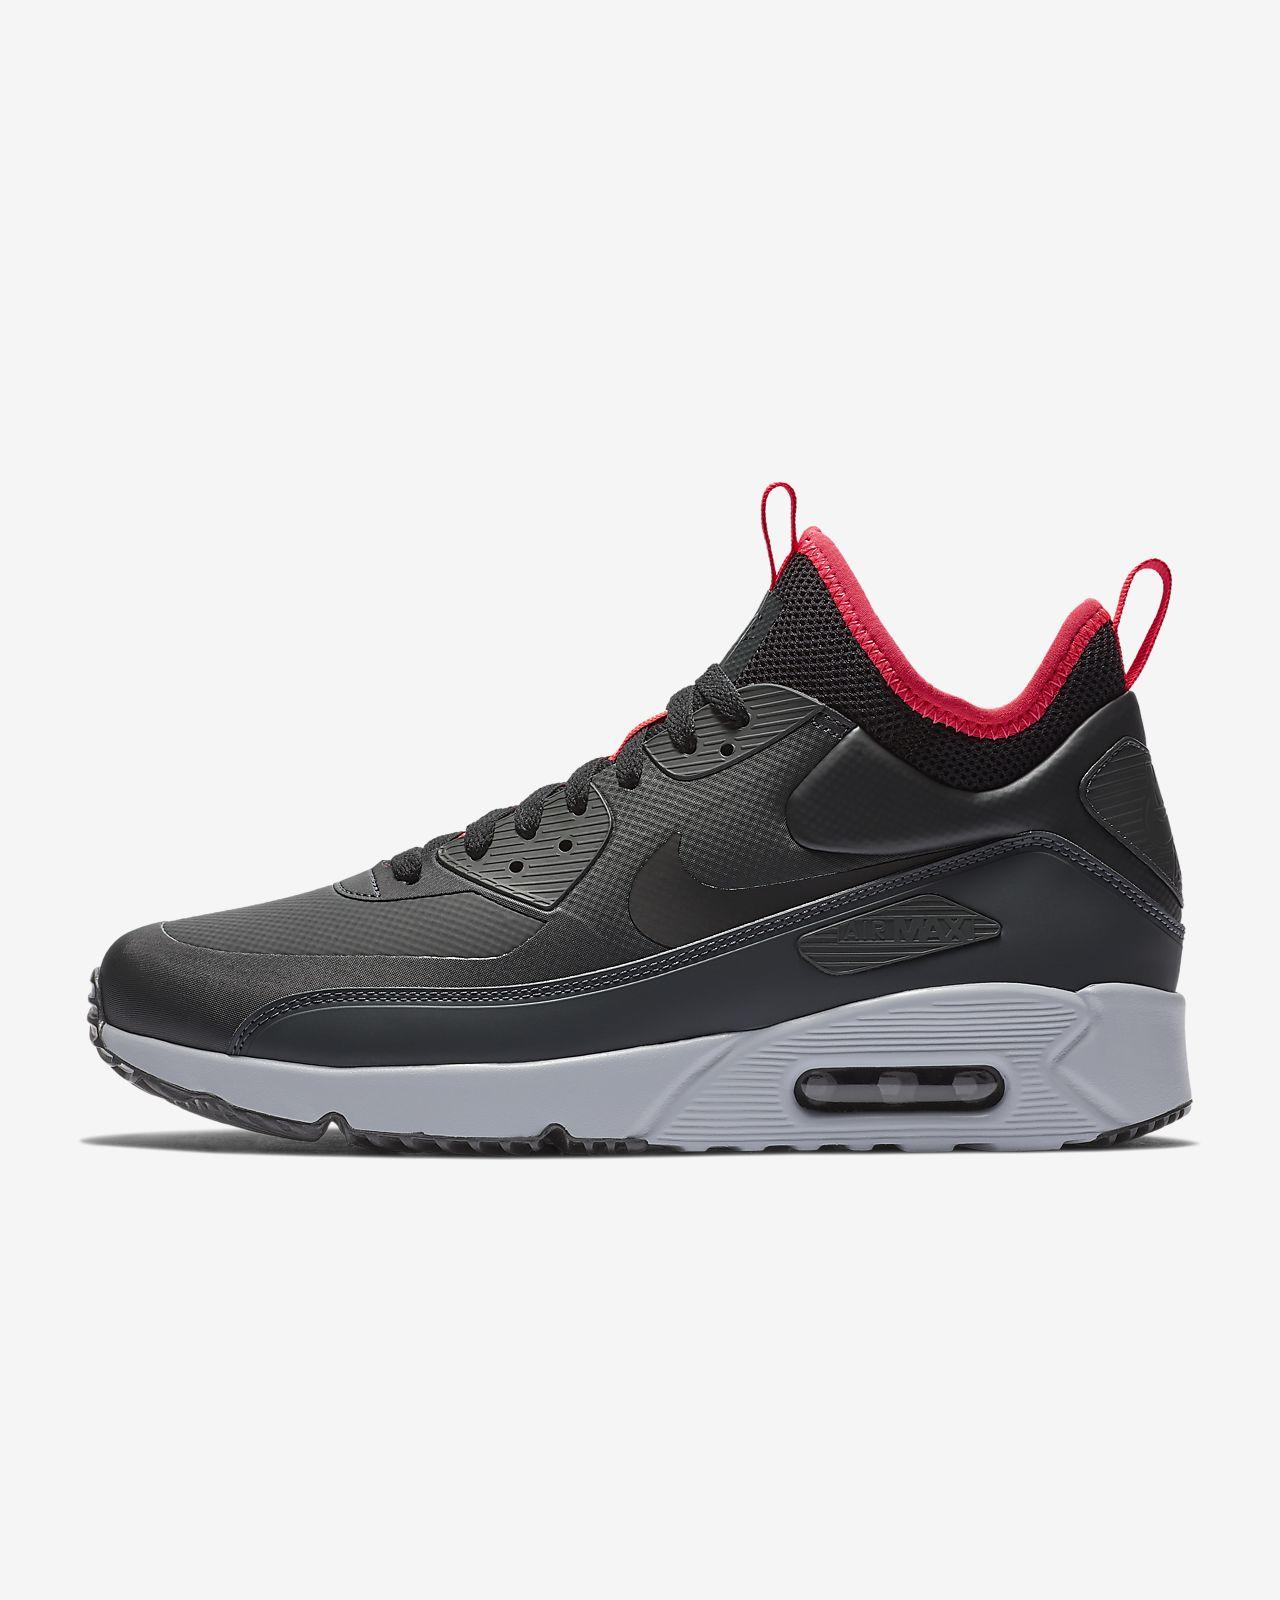 acheter en ligne 30d41 1deef Chaussure Nike Air Max 90 Ultra Mid Winter pour Homme